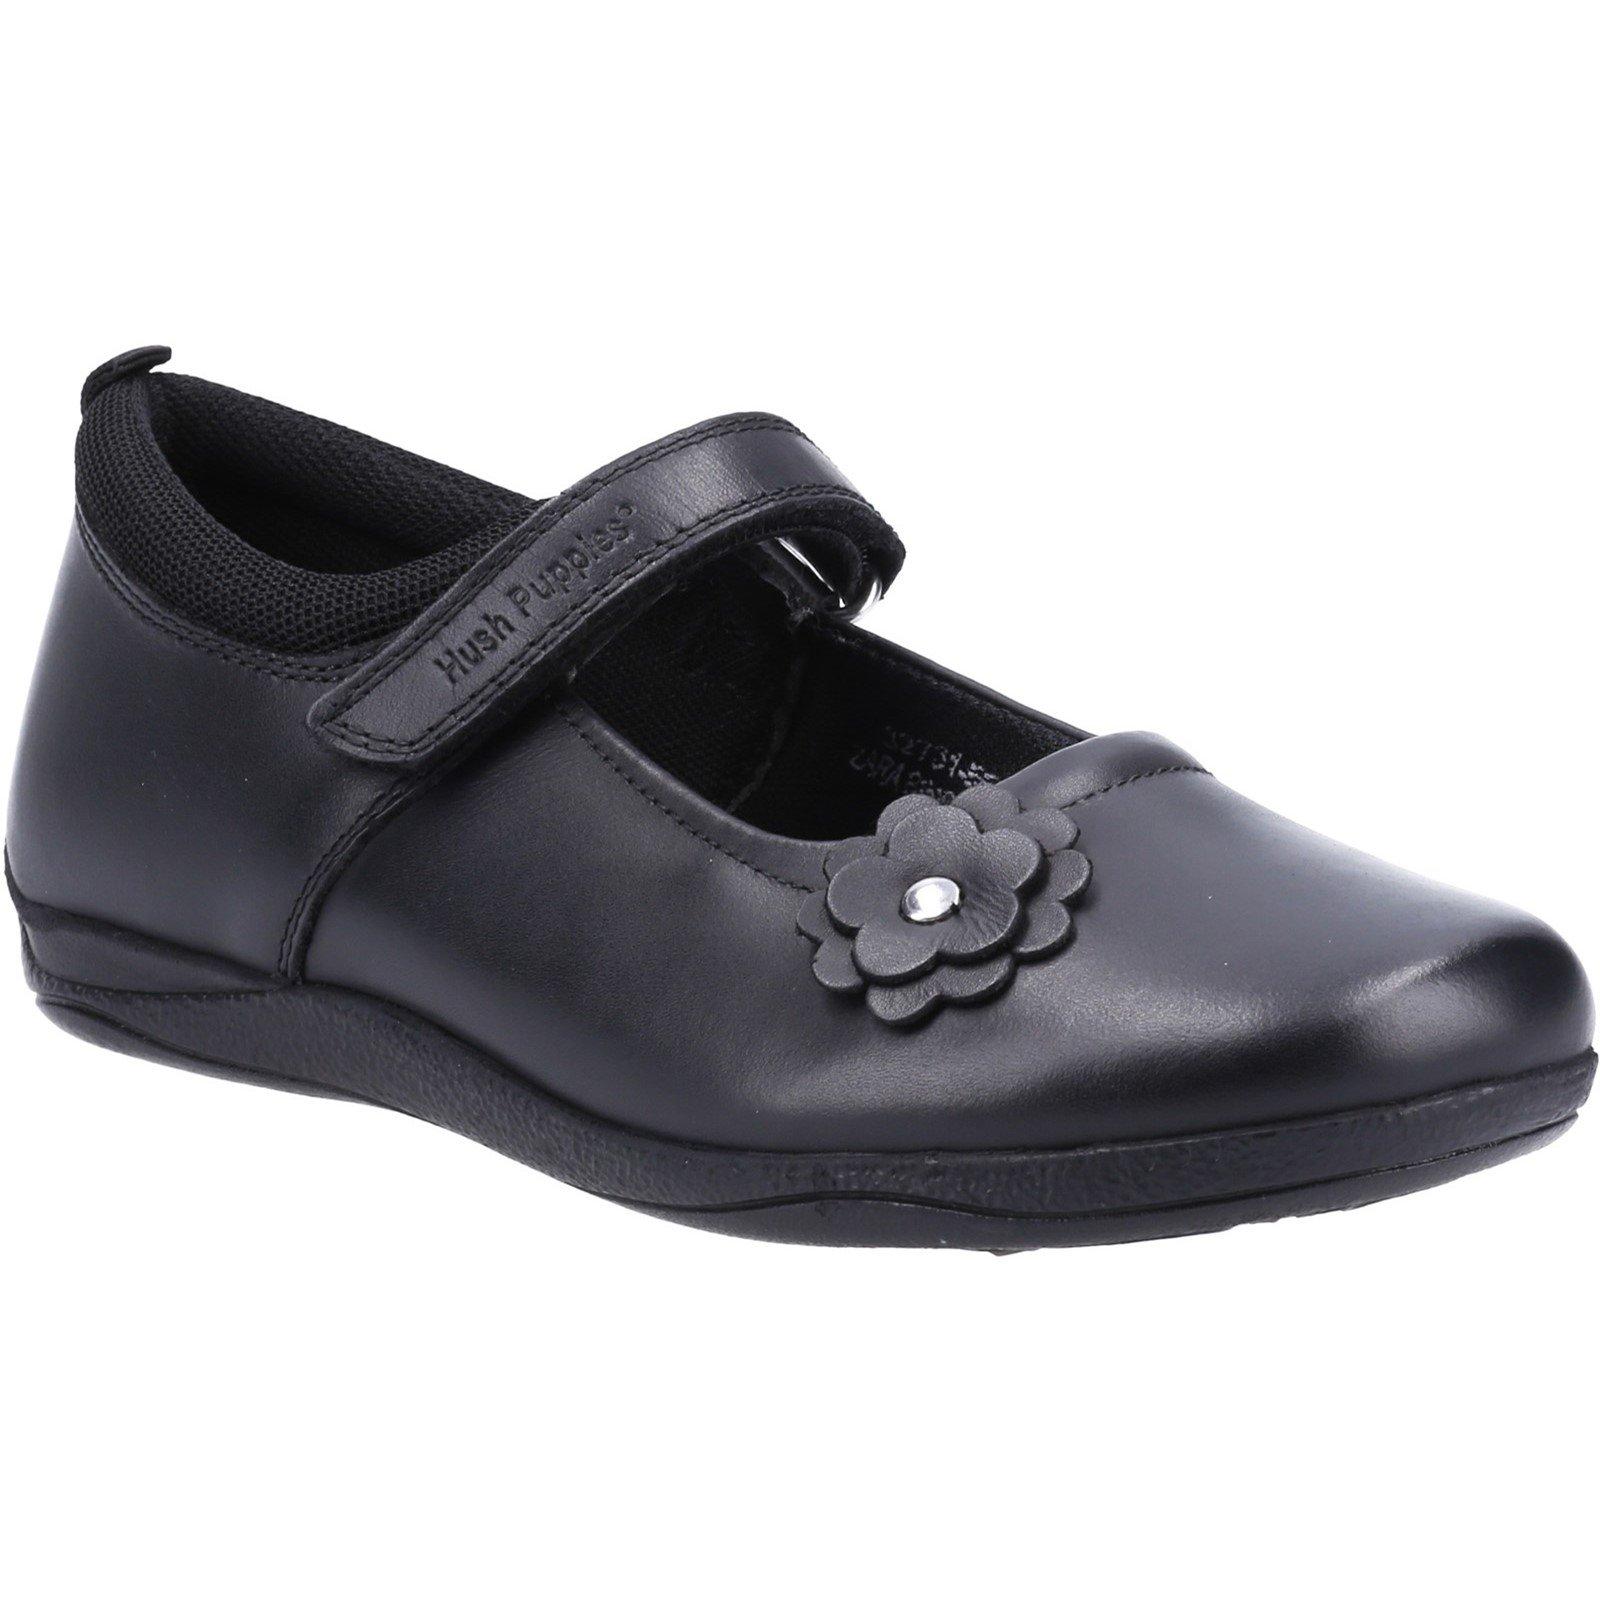 Hush Puppies Kid's Zara Junior School Flat Shoe Black 32731 - Black 11